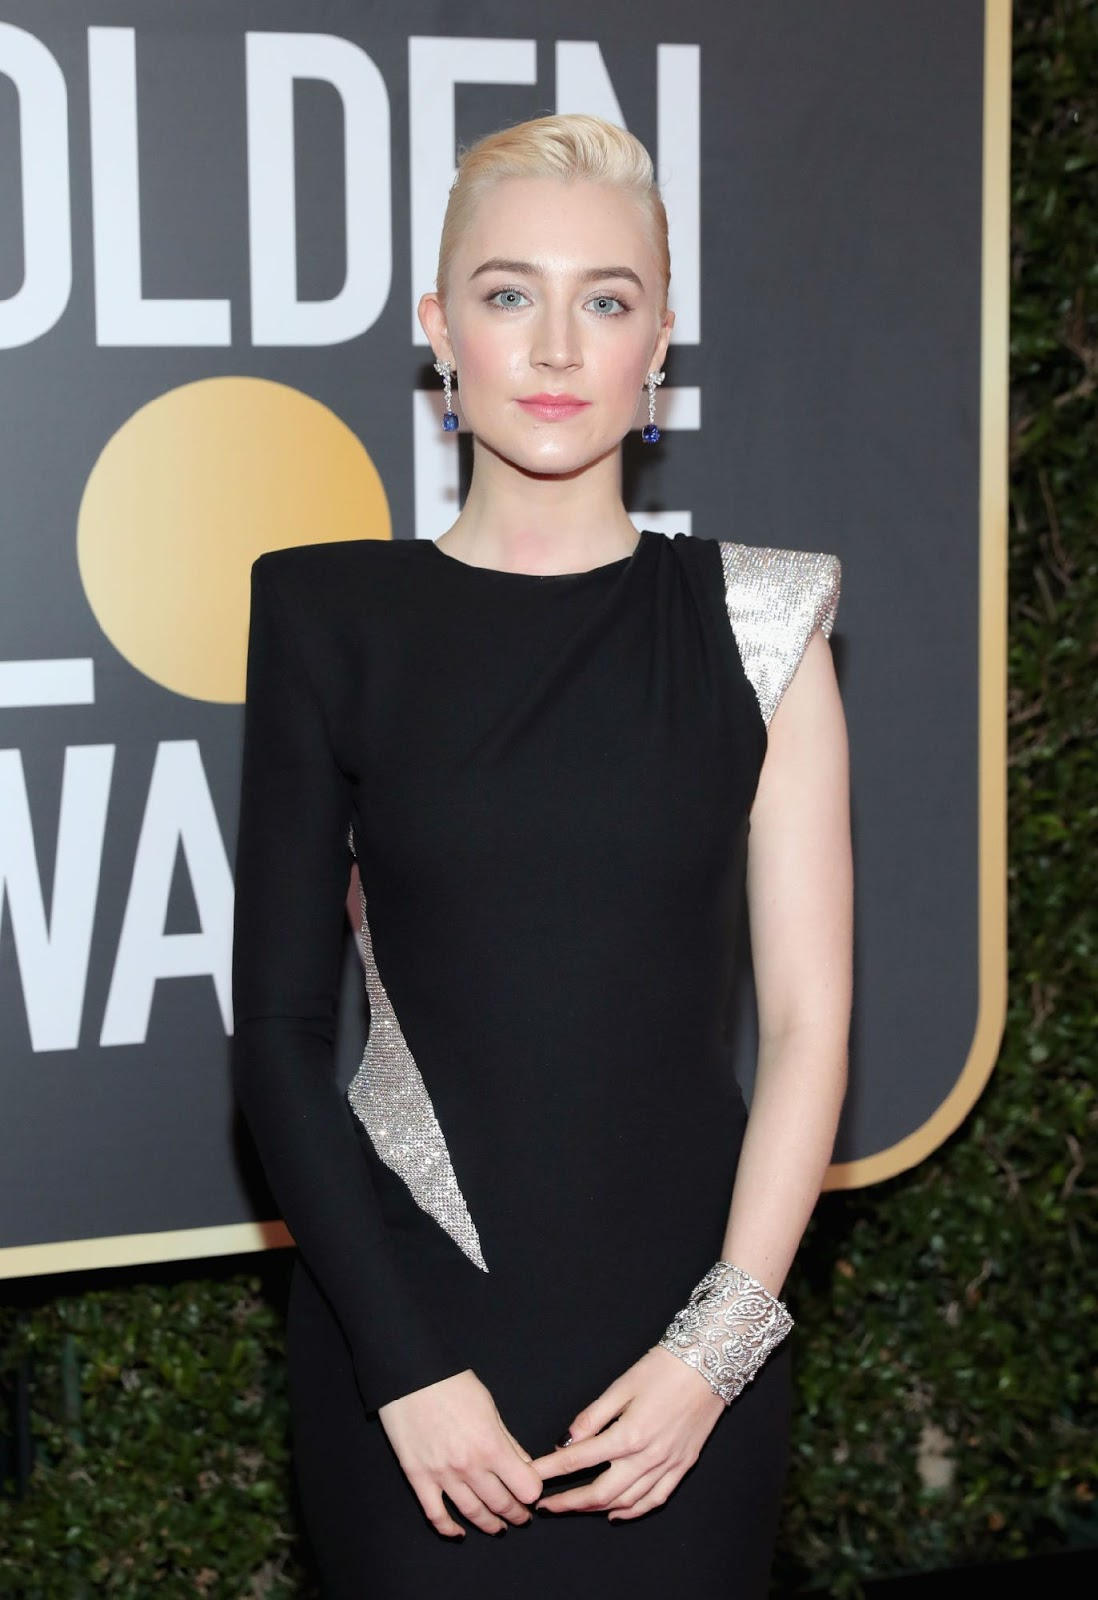 Saoirse Ronan Black Dress on the Red Carpet at Golden Globe Awards